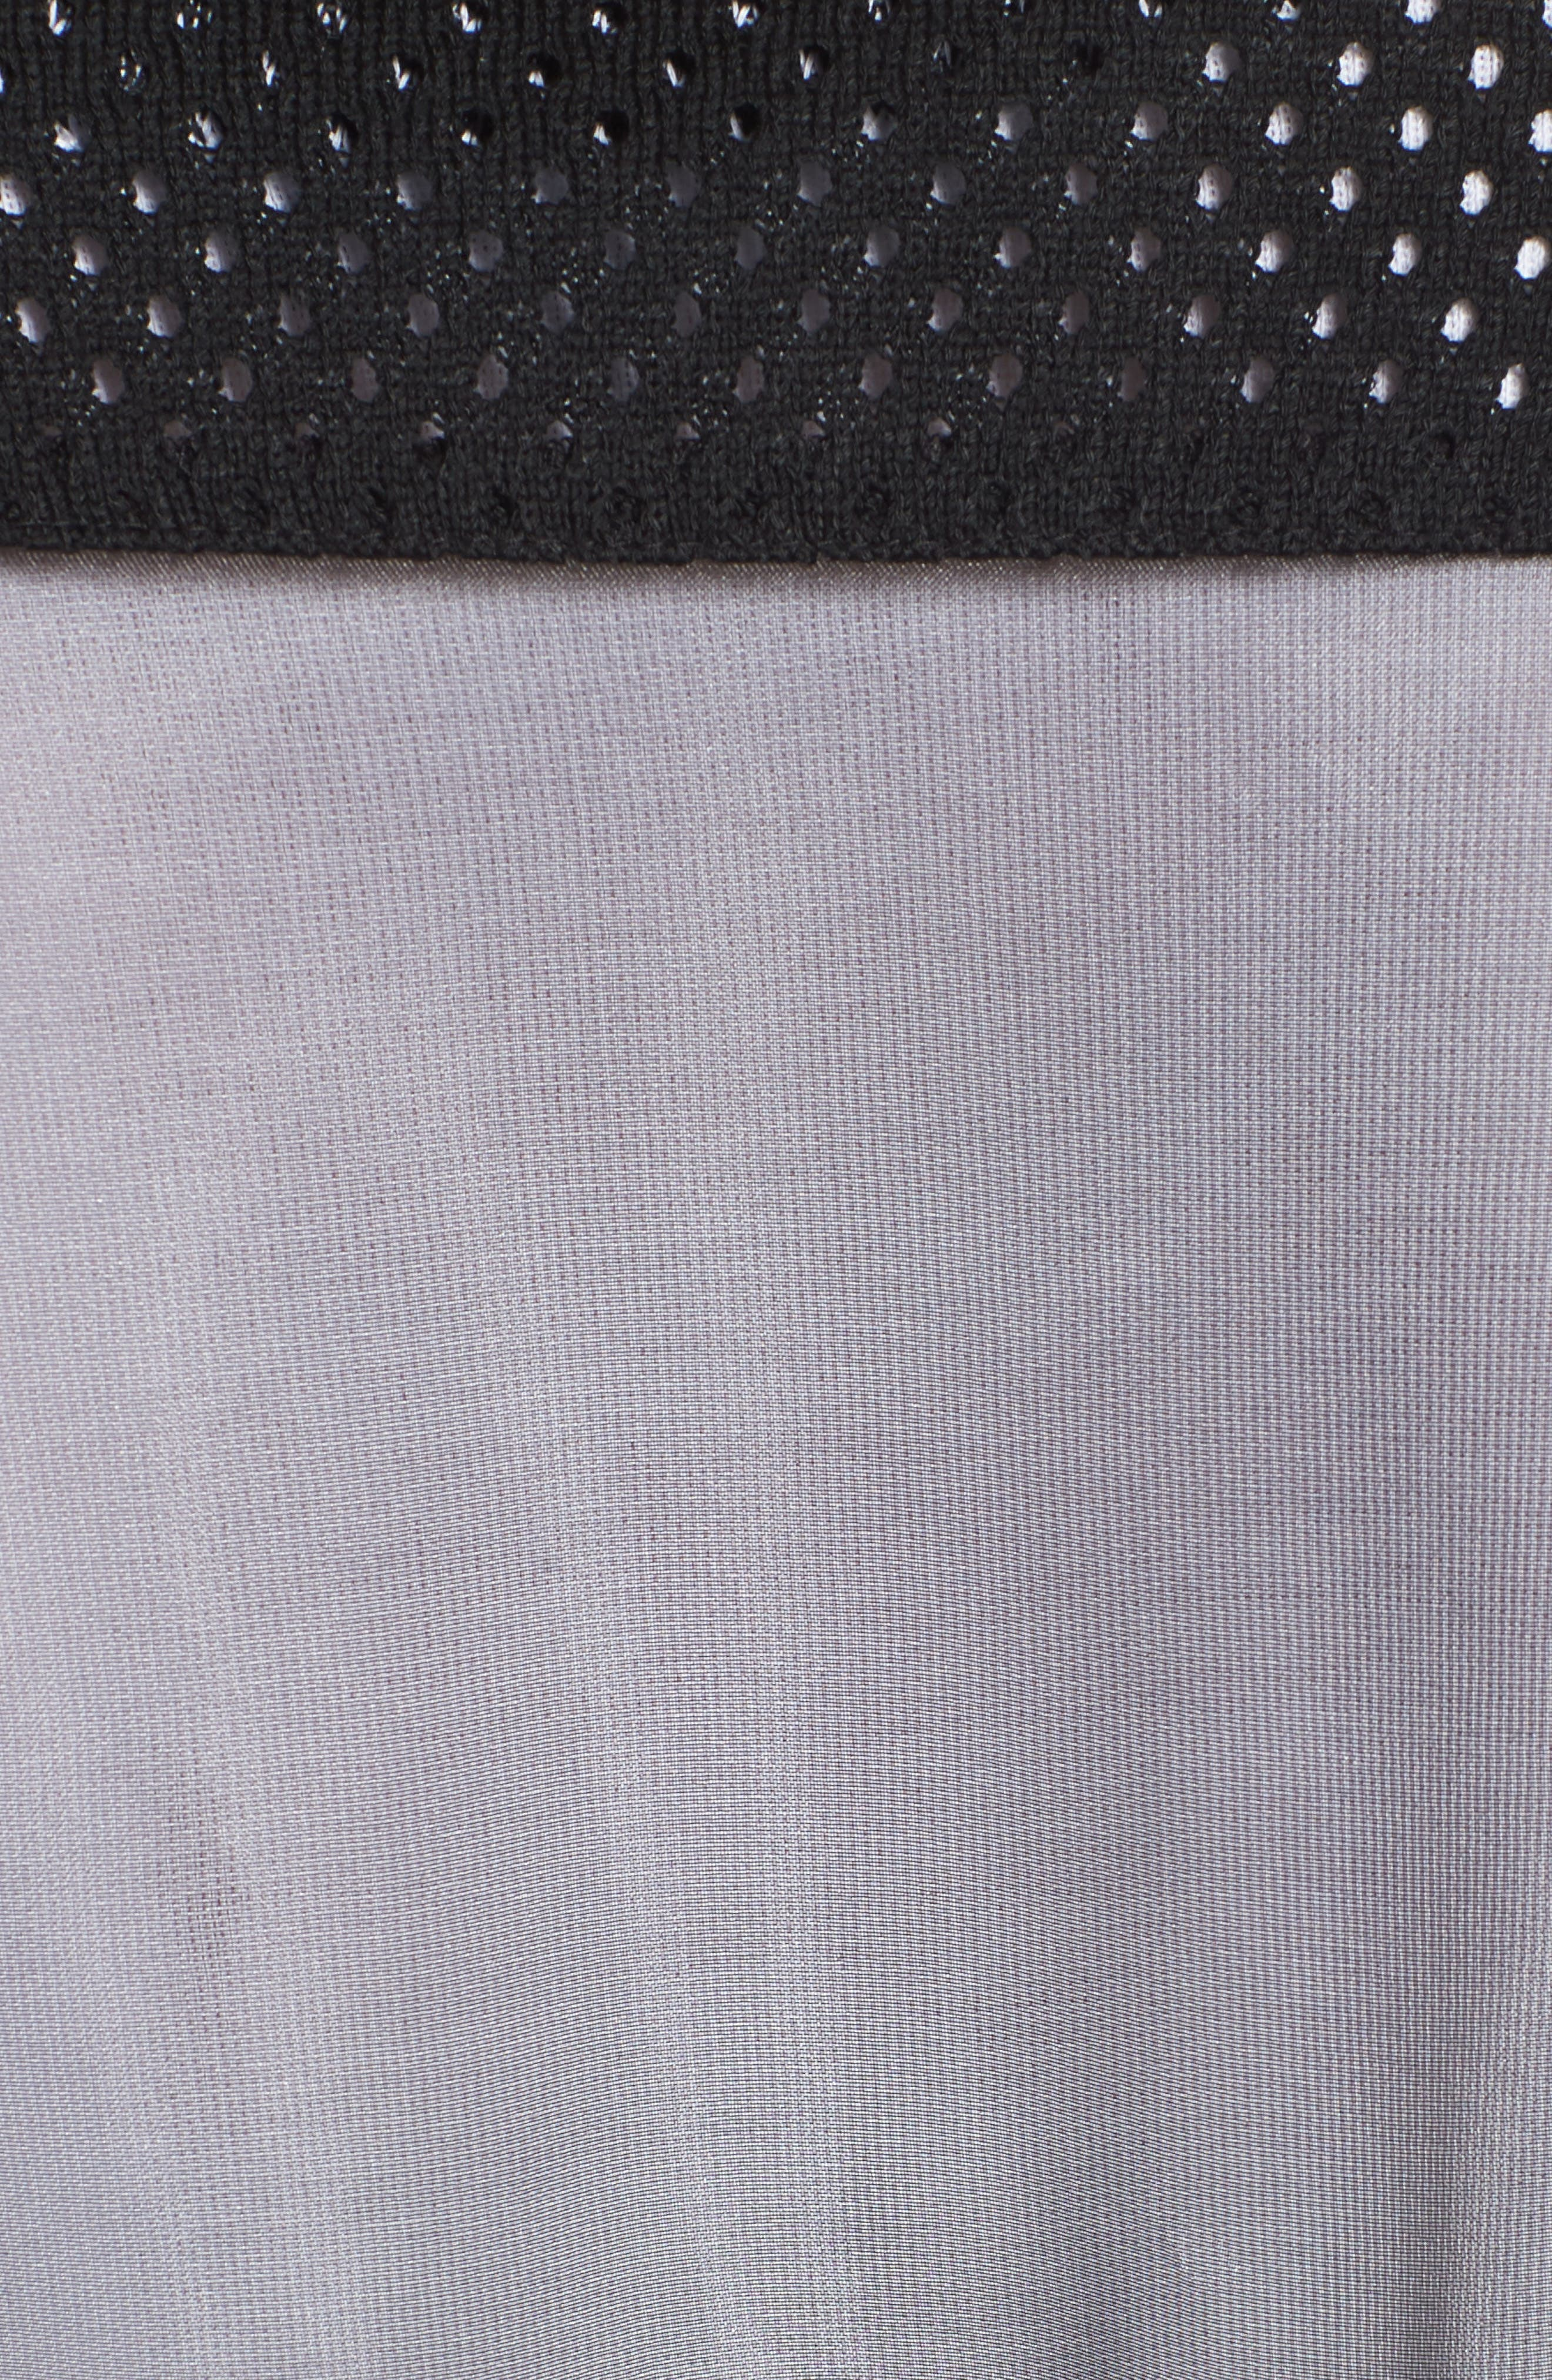 Sheer Jacket,                             Alternate thumbnail 5, color,                             Black